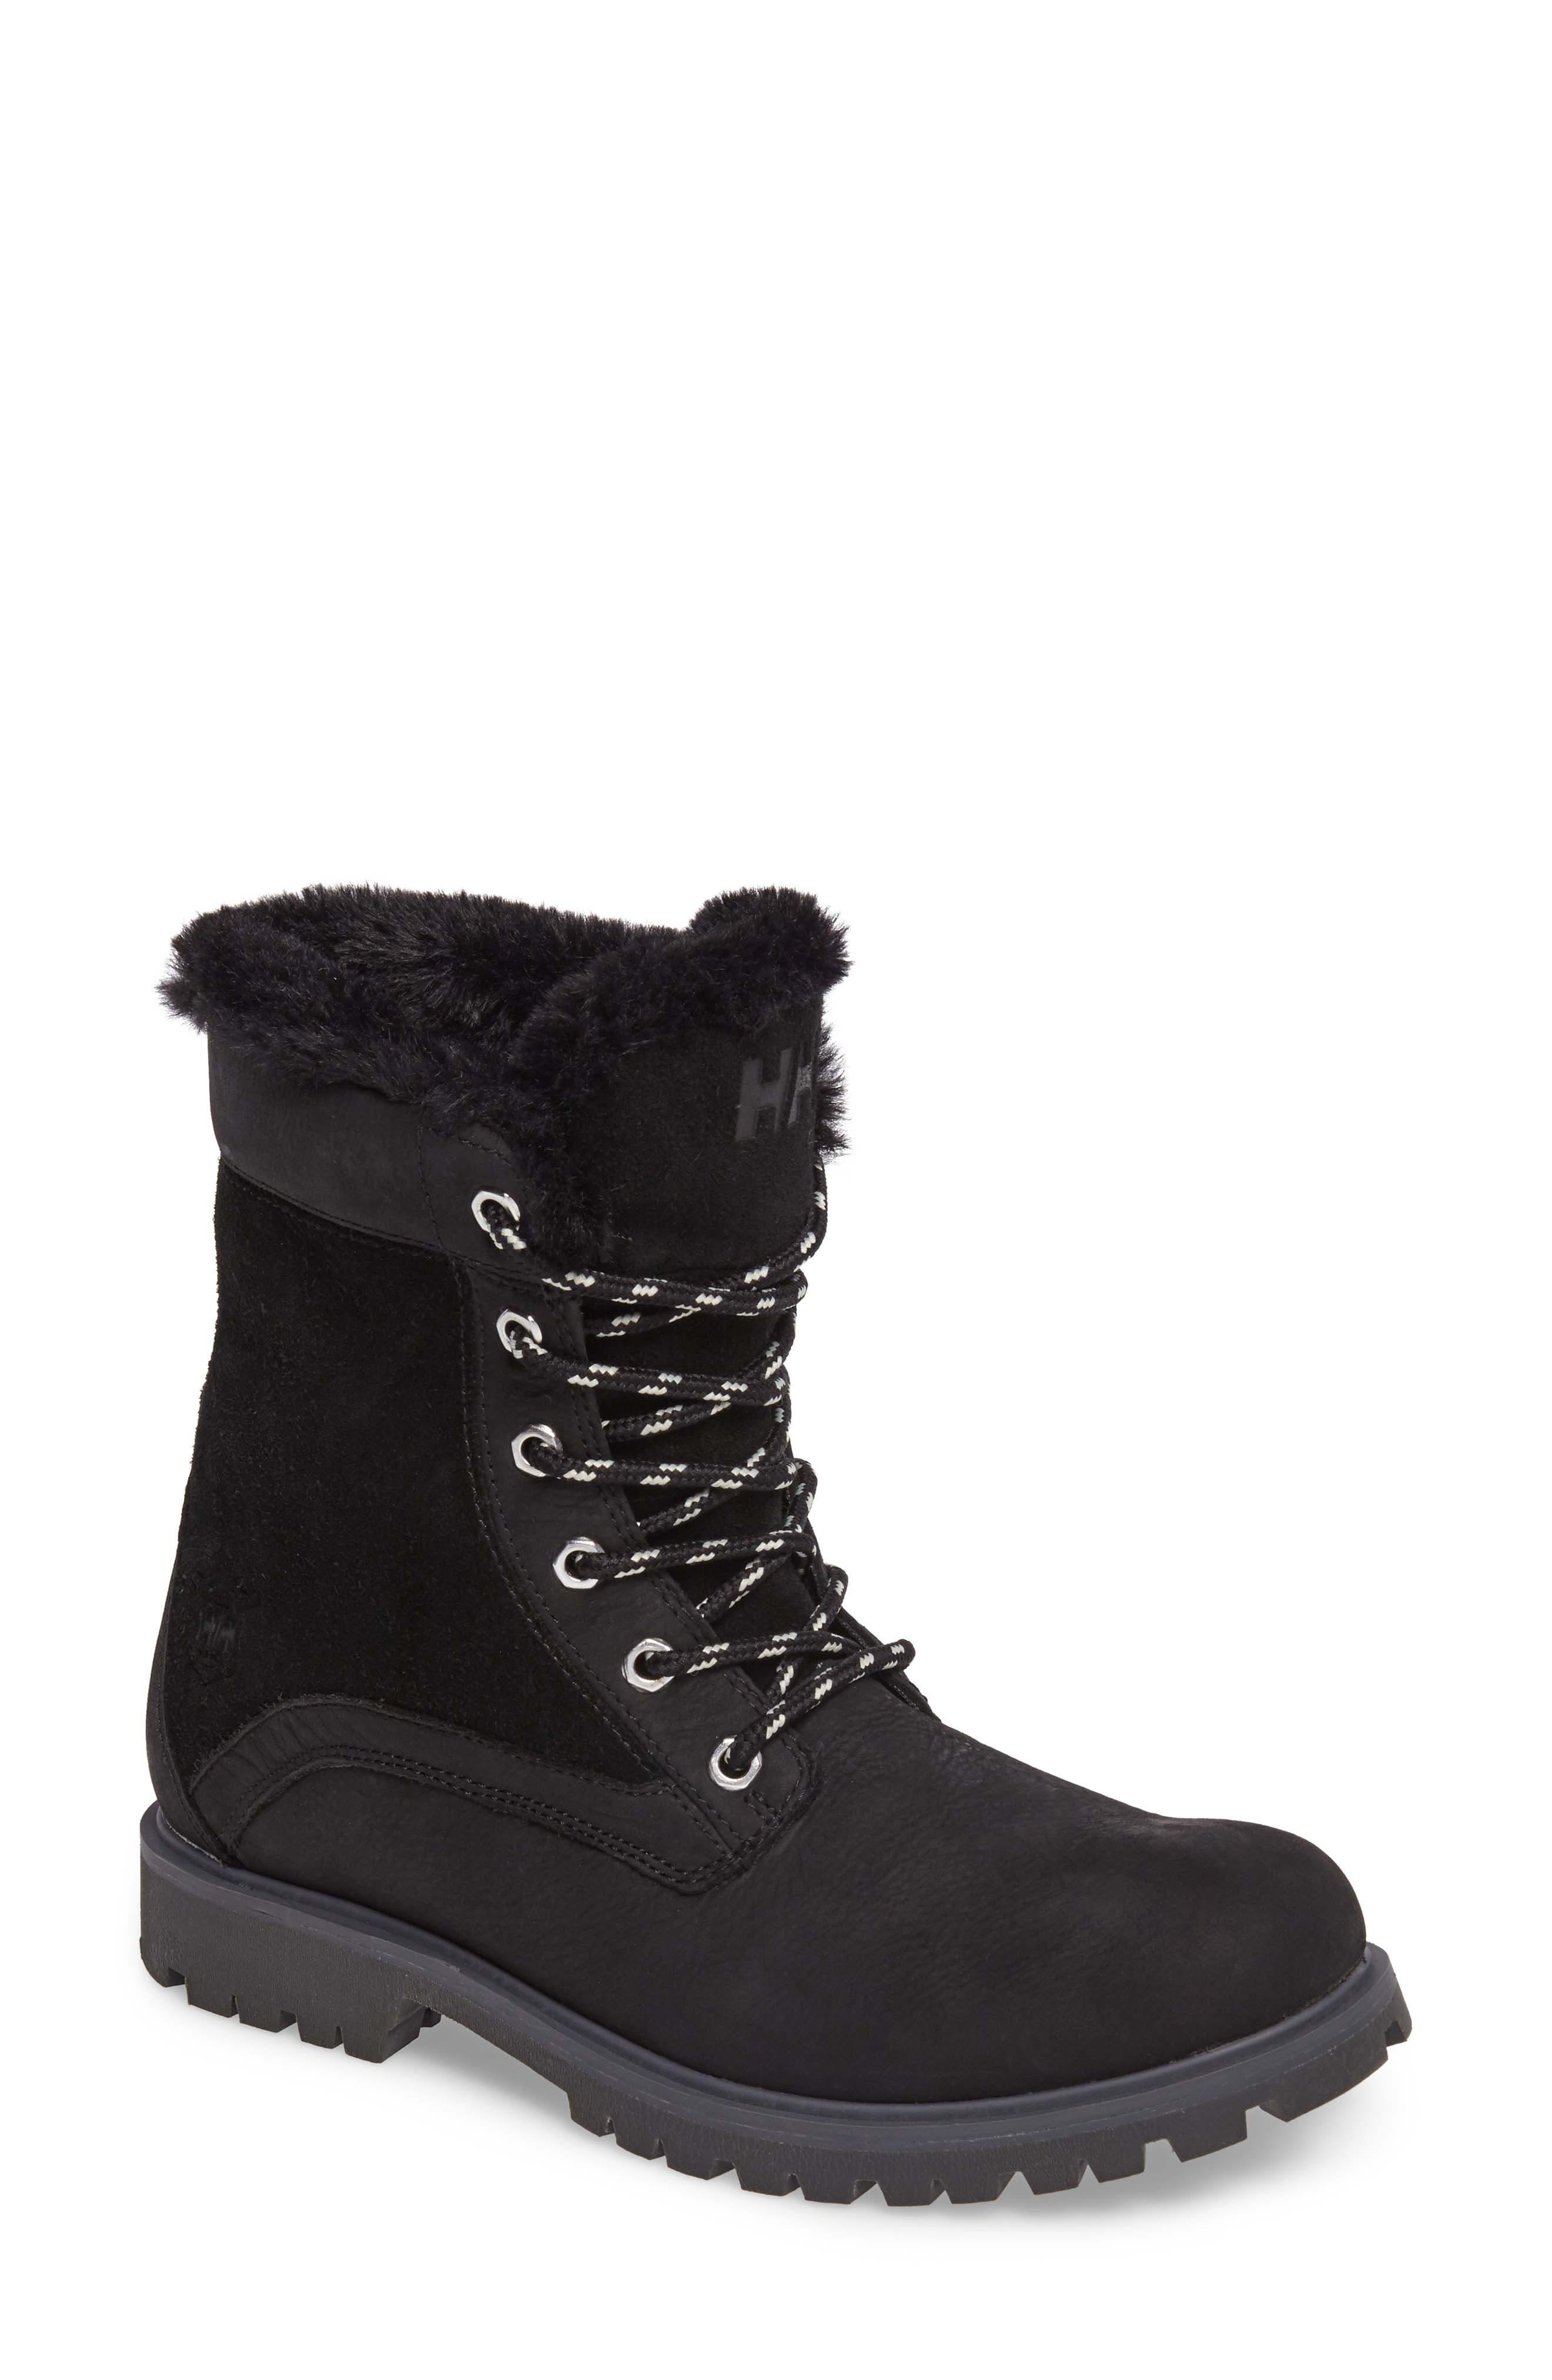 Marion Waterproof Winter Boot,                         Main,                         color, Jet Black / Ebony / Black